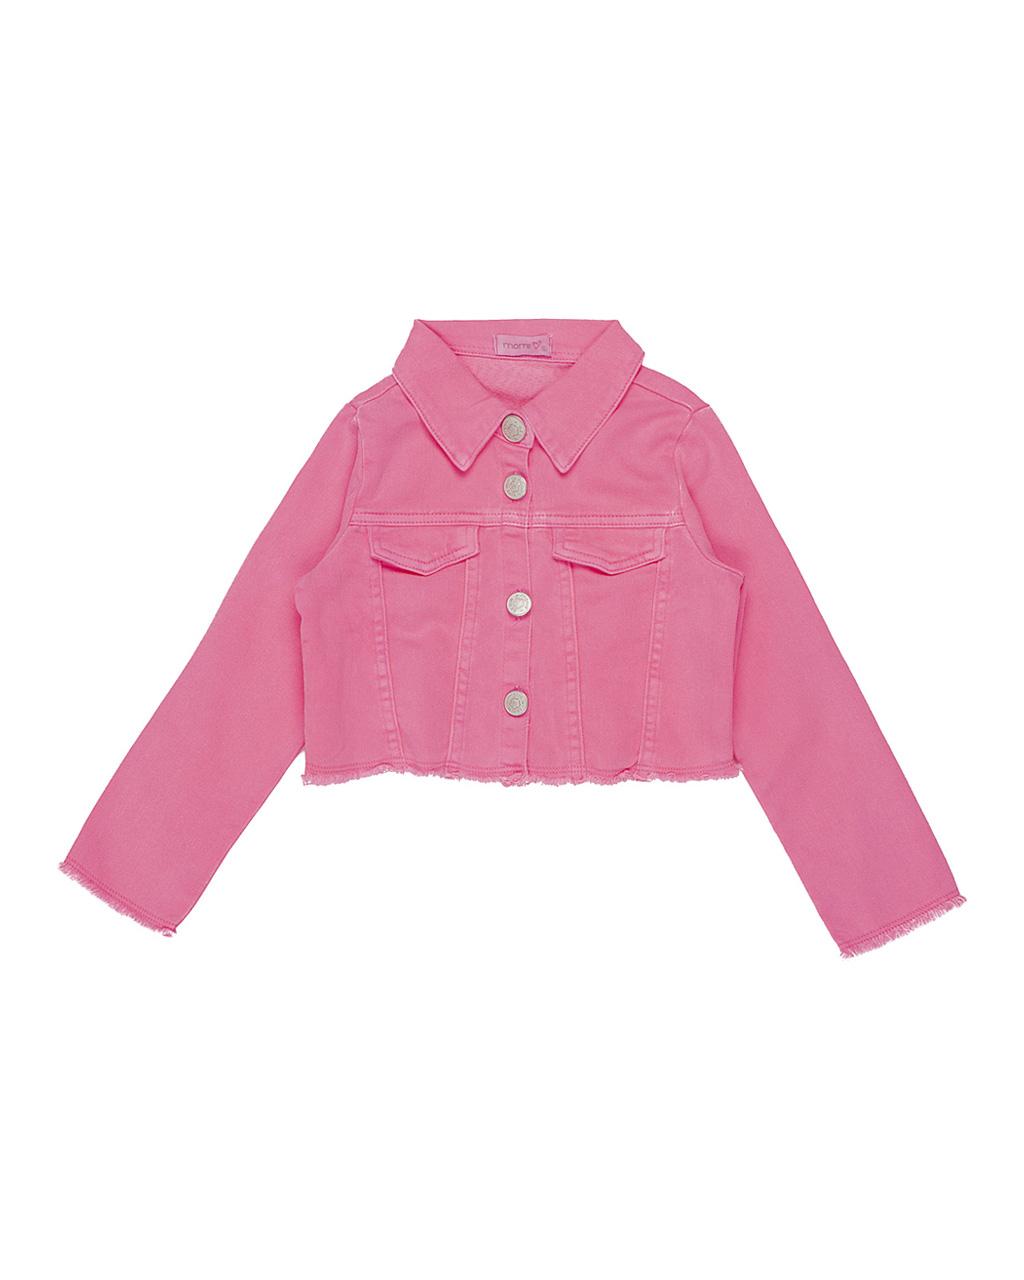 Jaqueta Infantil Sarja Rosa Neon Momi